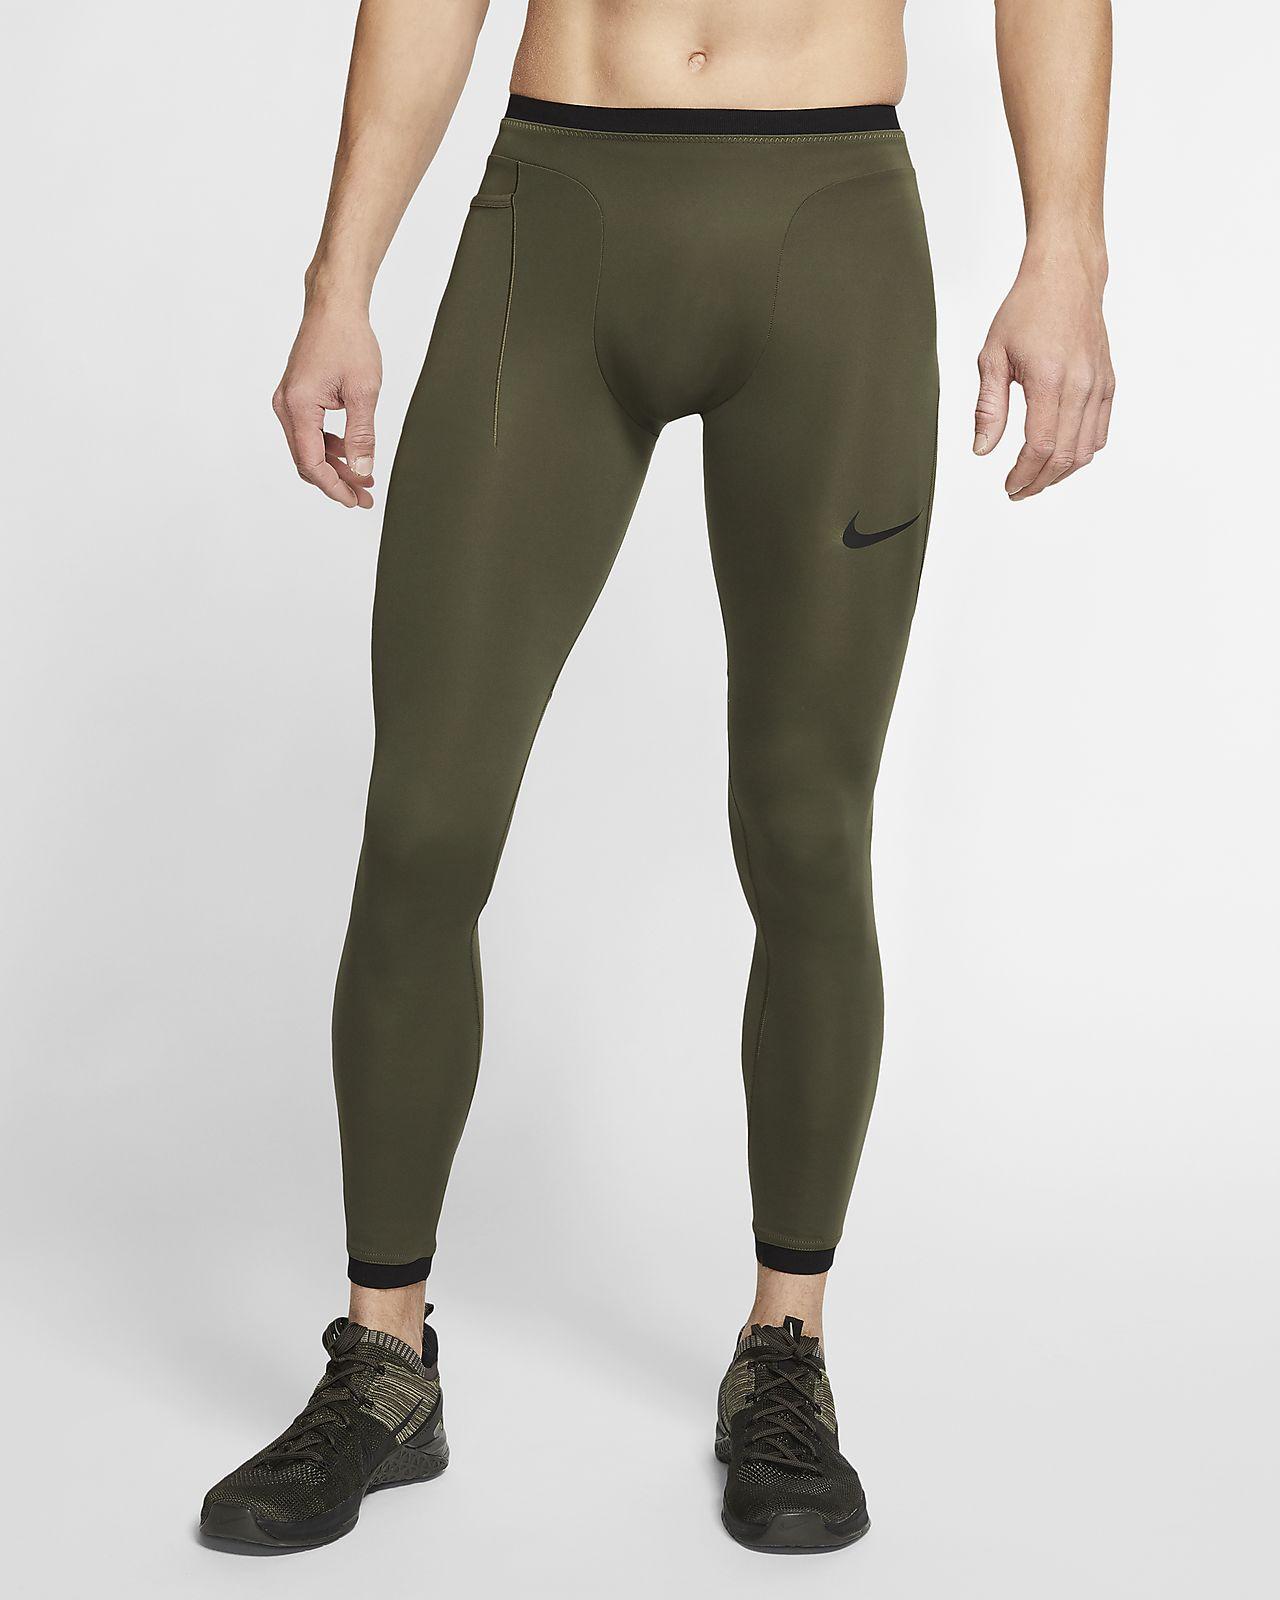 Nike Pro Malles - Home